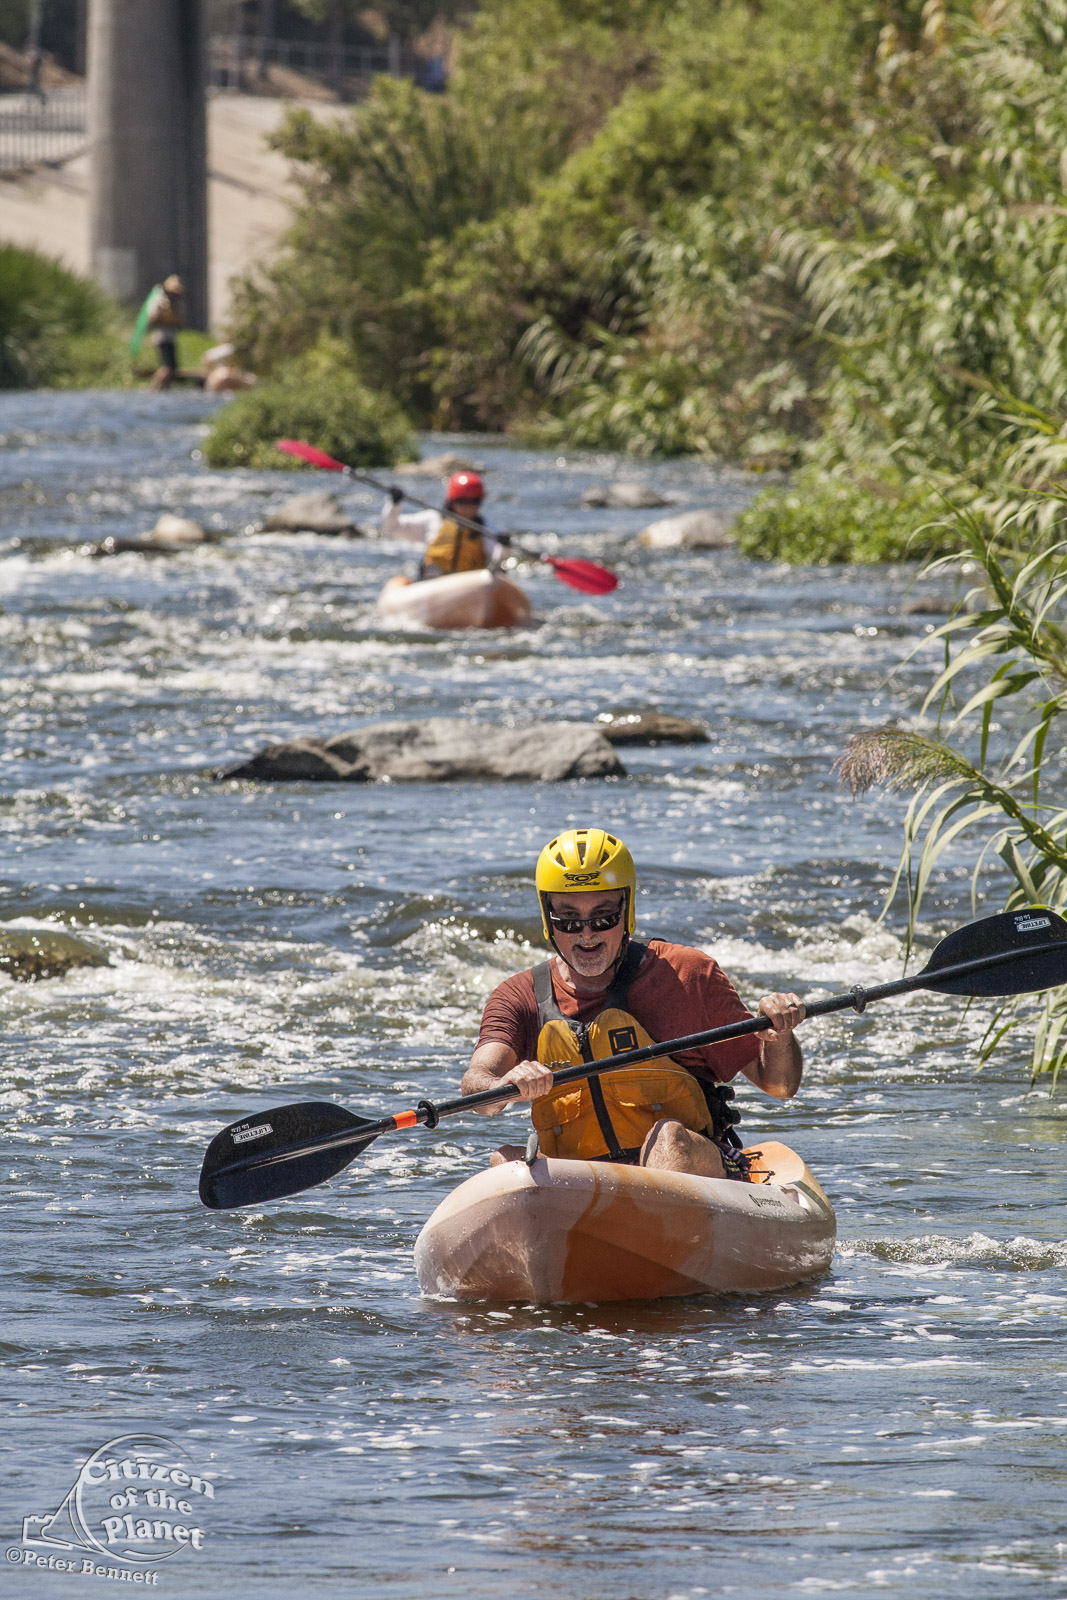 US_CA_48_3880_la_river_boat_race.jpg